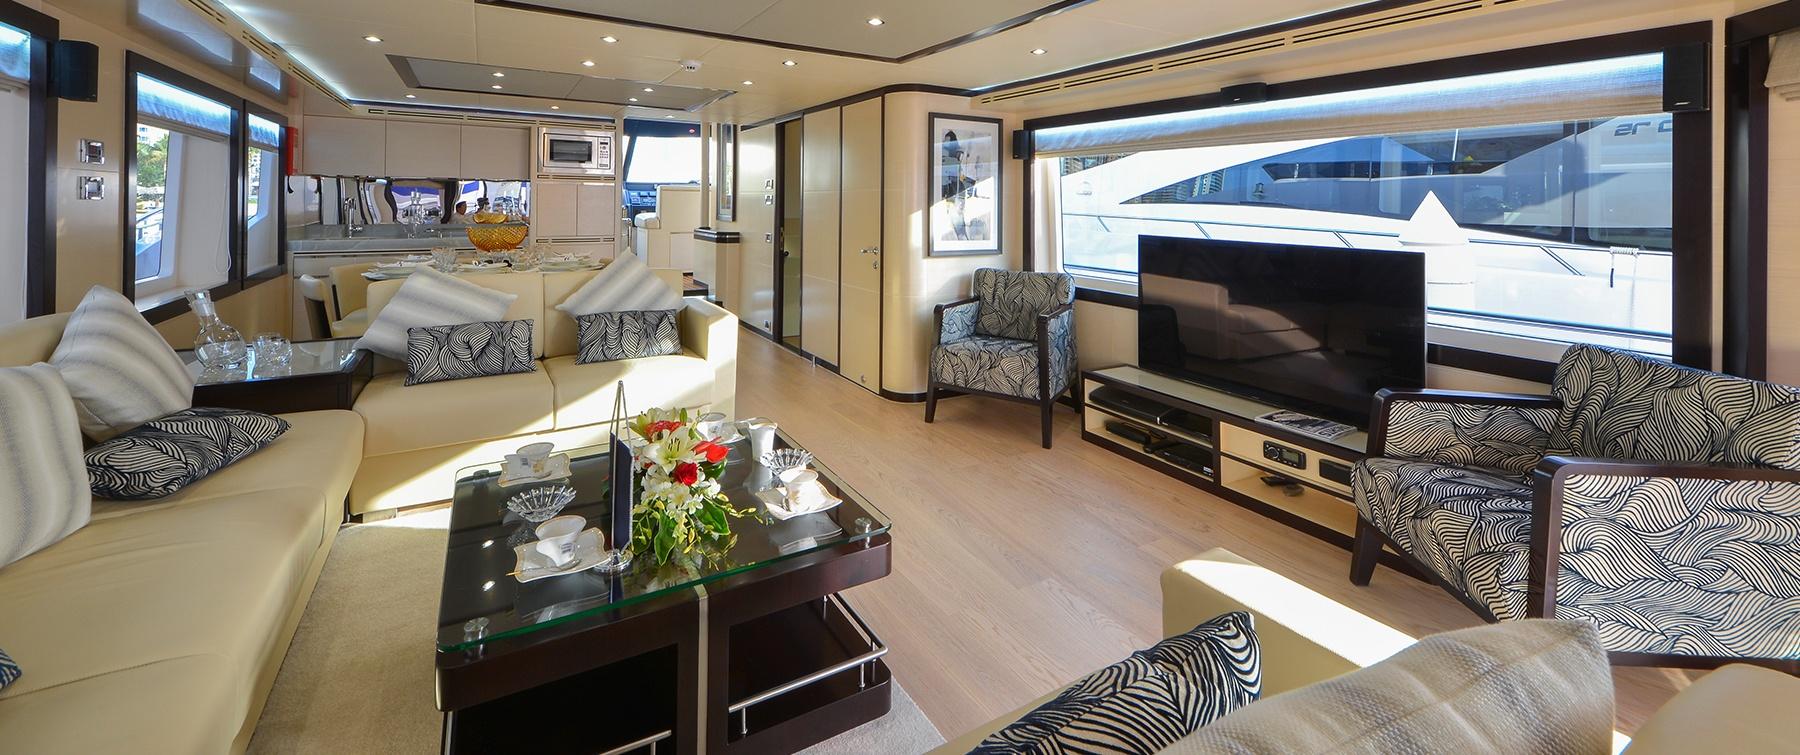 Luxurious Interior of Nomad 75